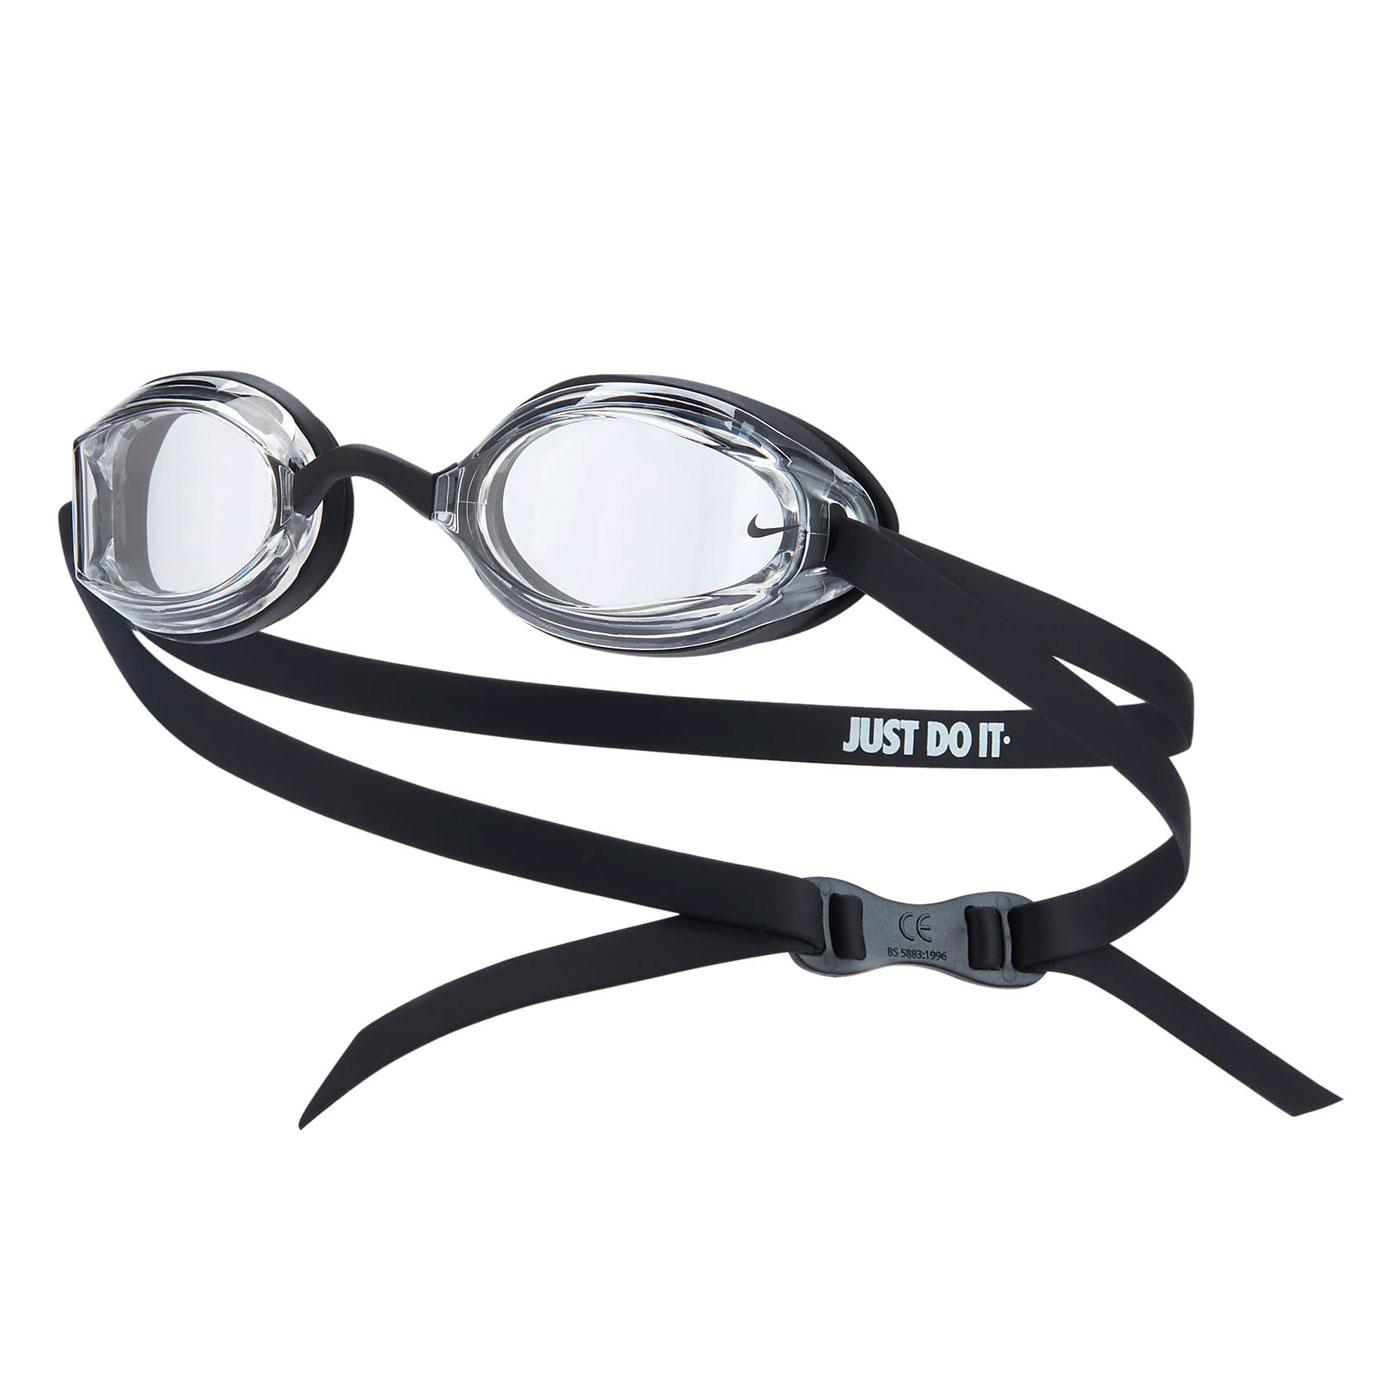 NIKE SWIM 成人專業型泳鏡 NESSA179-006 - 黑白